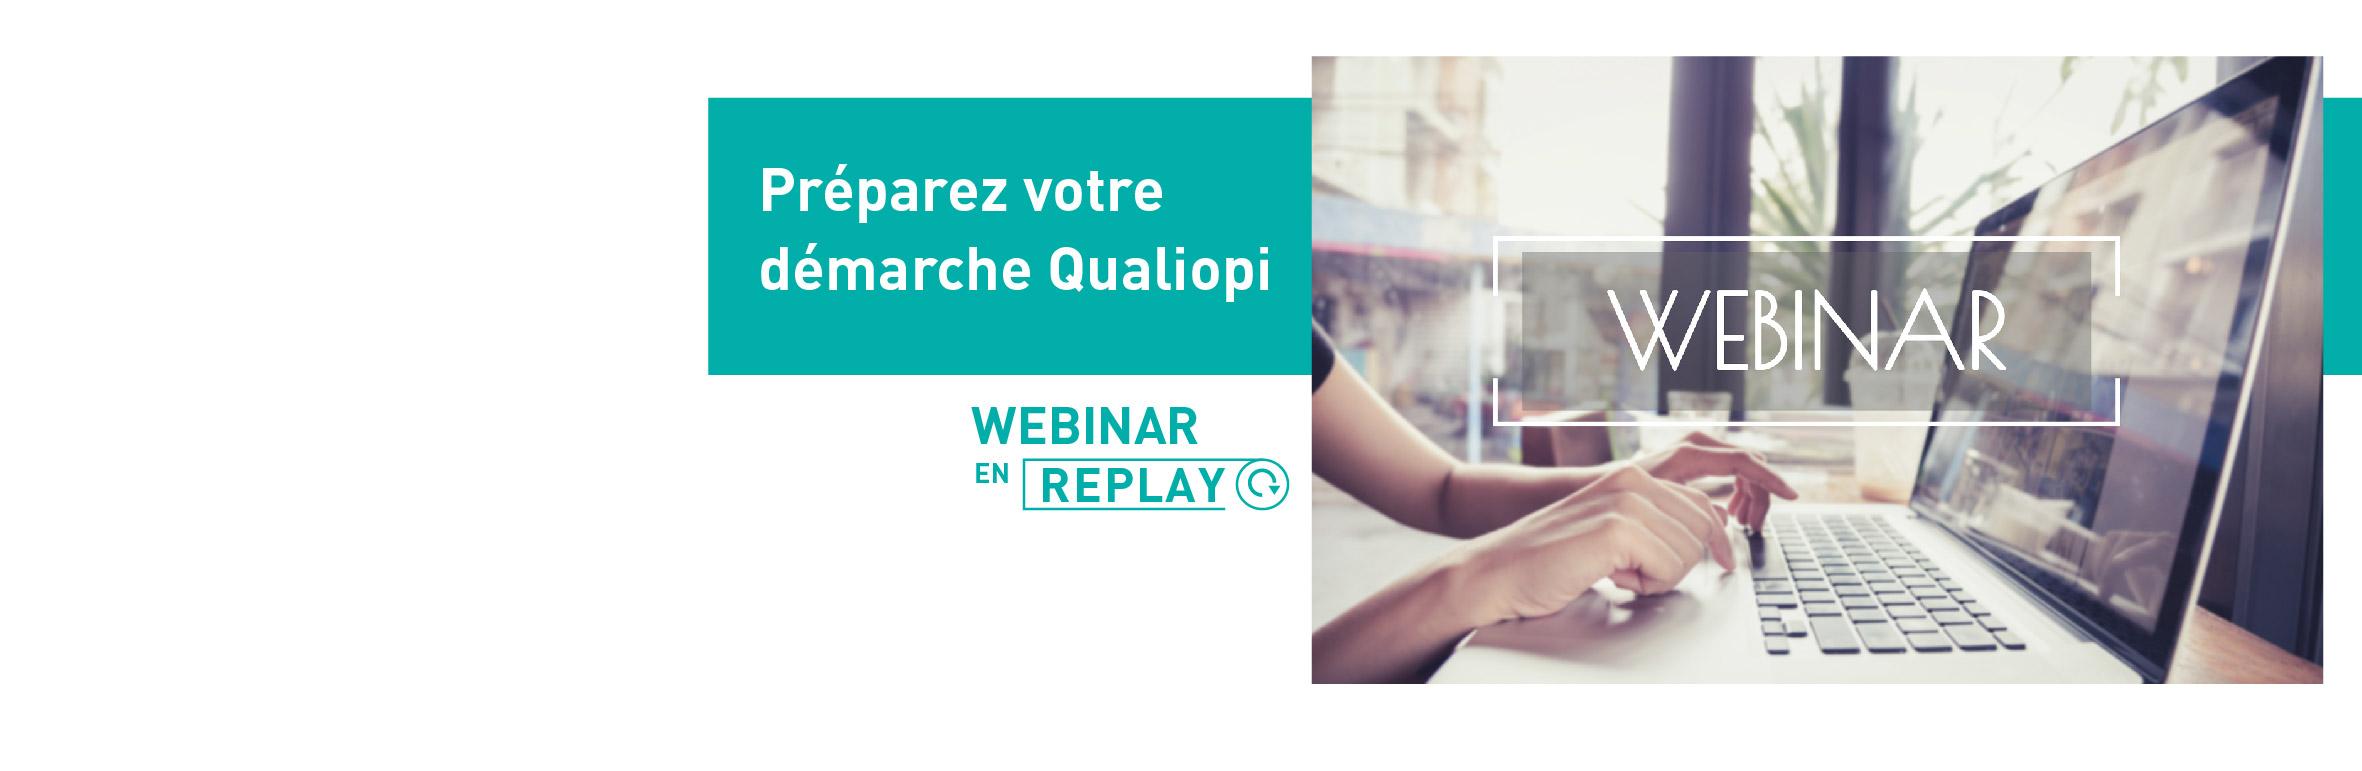 Replay webinar Qualiopi